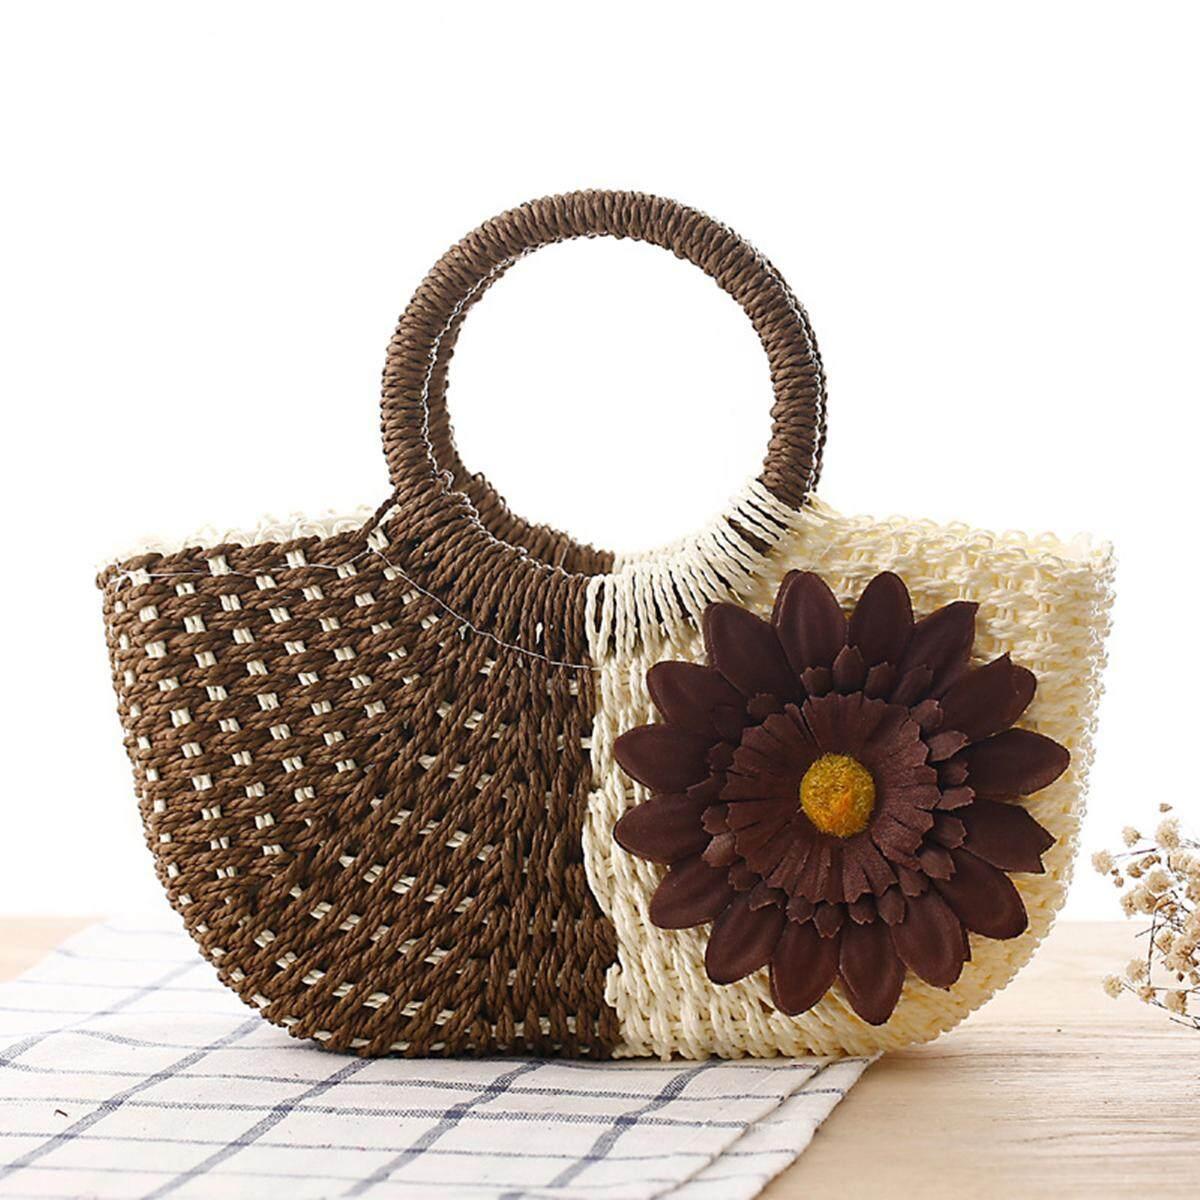 Fashion Women Flower Straw Bag Vacation Woven Tote Lady Summer Beach Handbag - intl